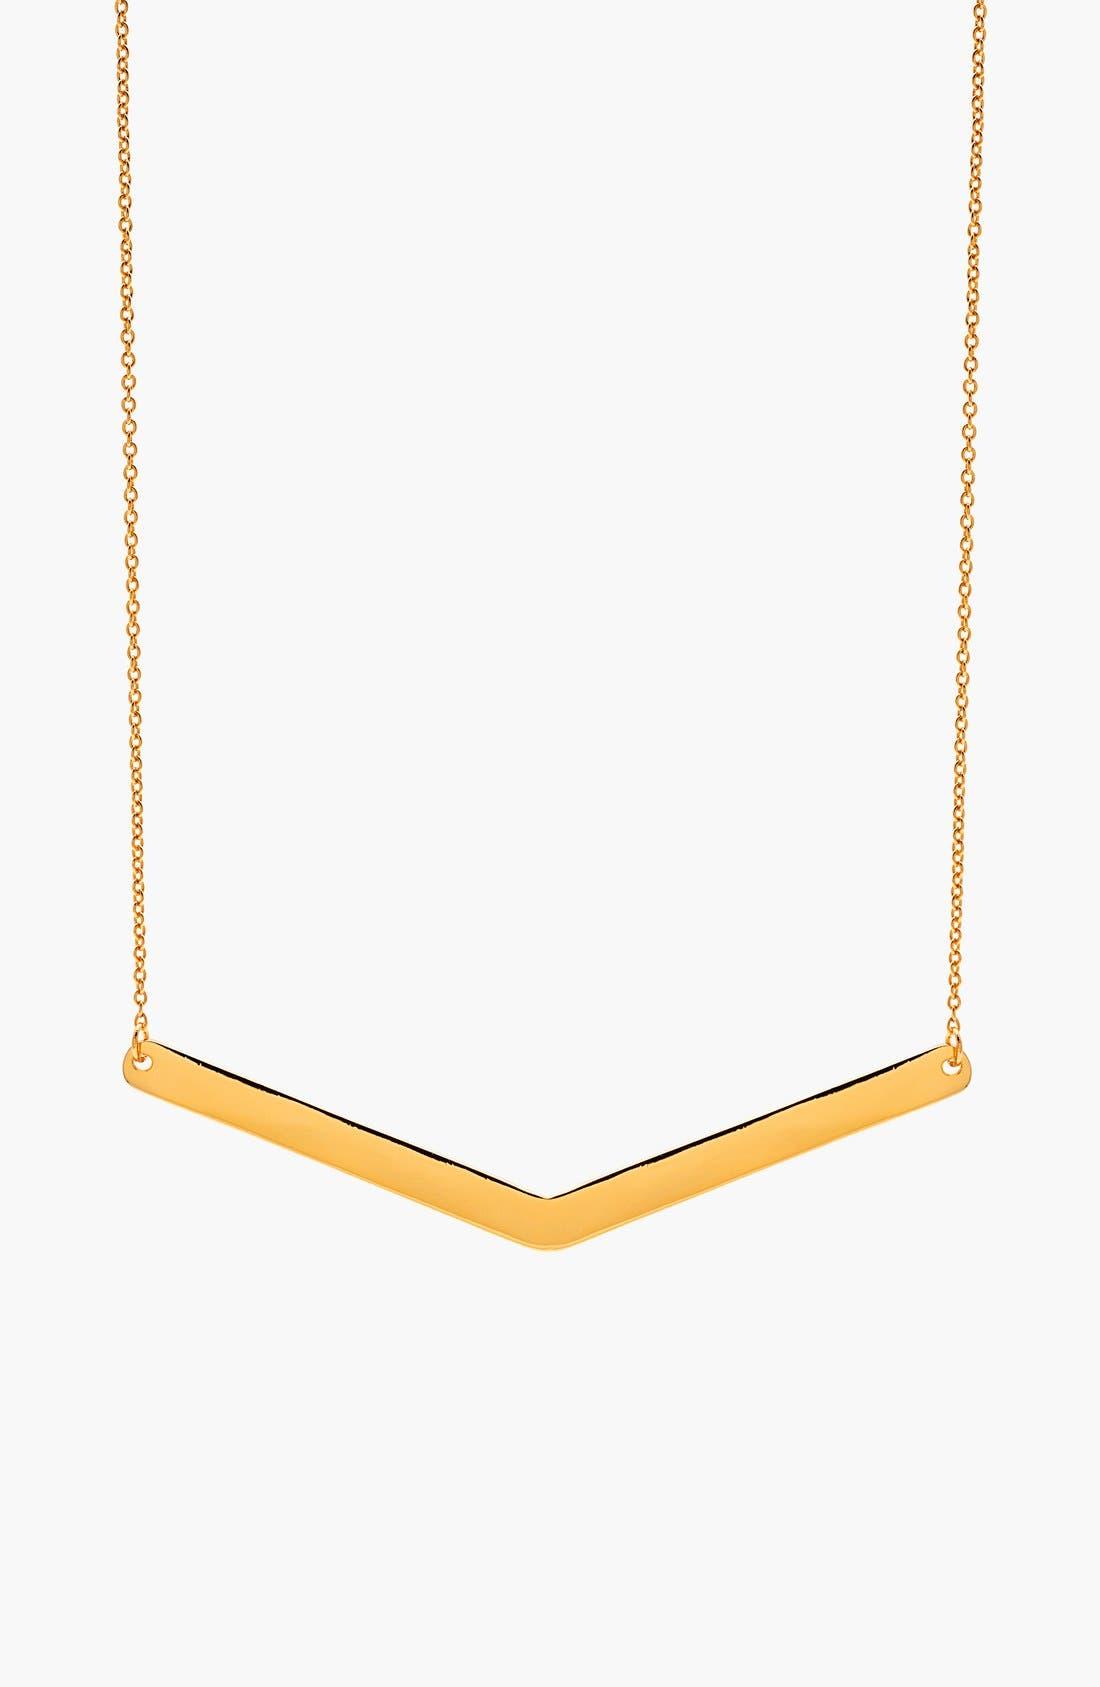 Alternate Image 1 Selected - gorjana 'Mila' V-Pendant Necklace